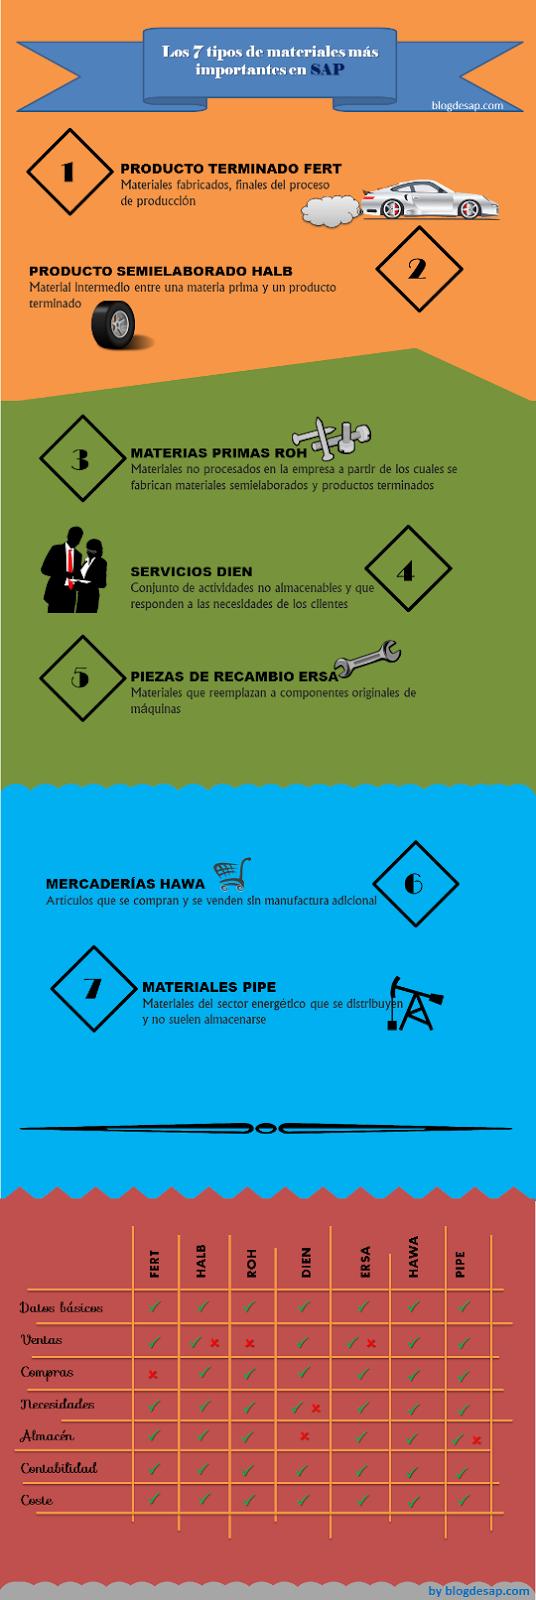 infografia materiales SAP